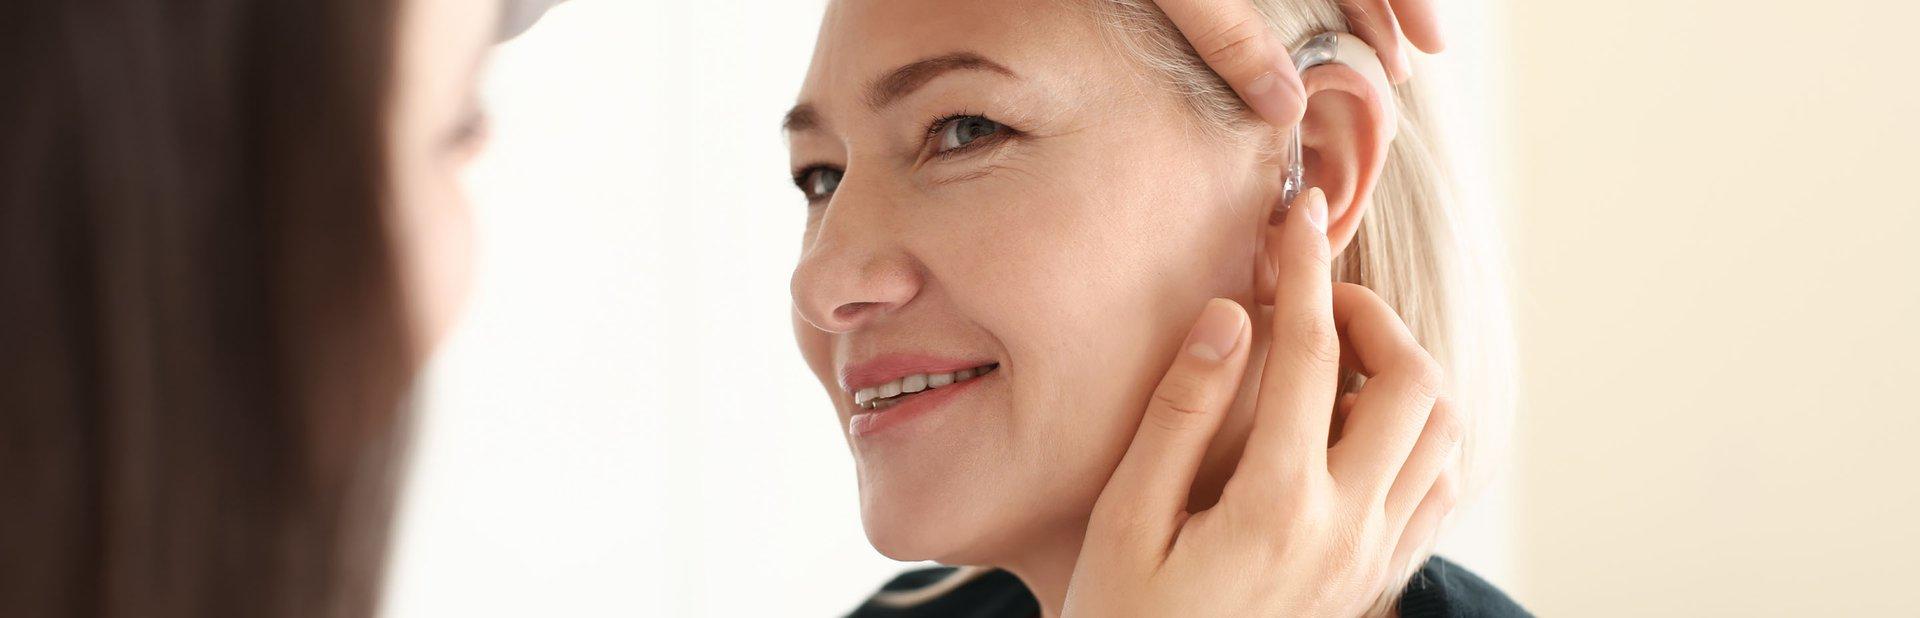 técnico superior en audiología protésica a distancia